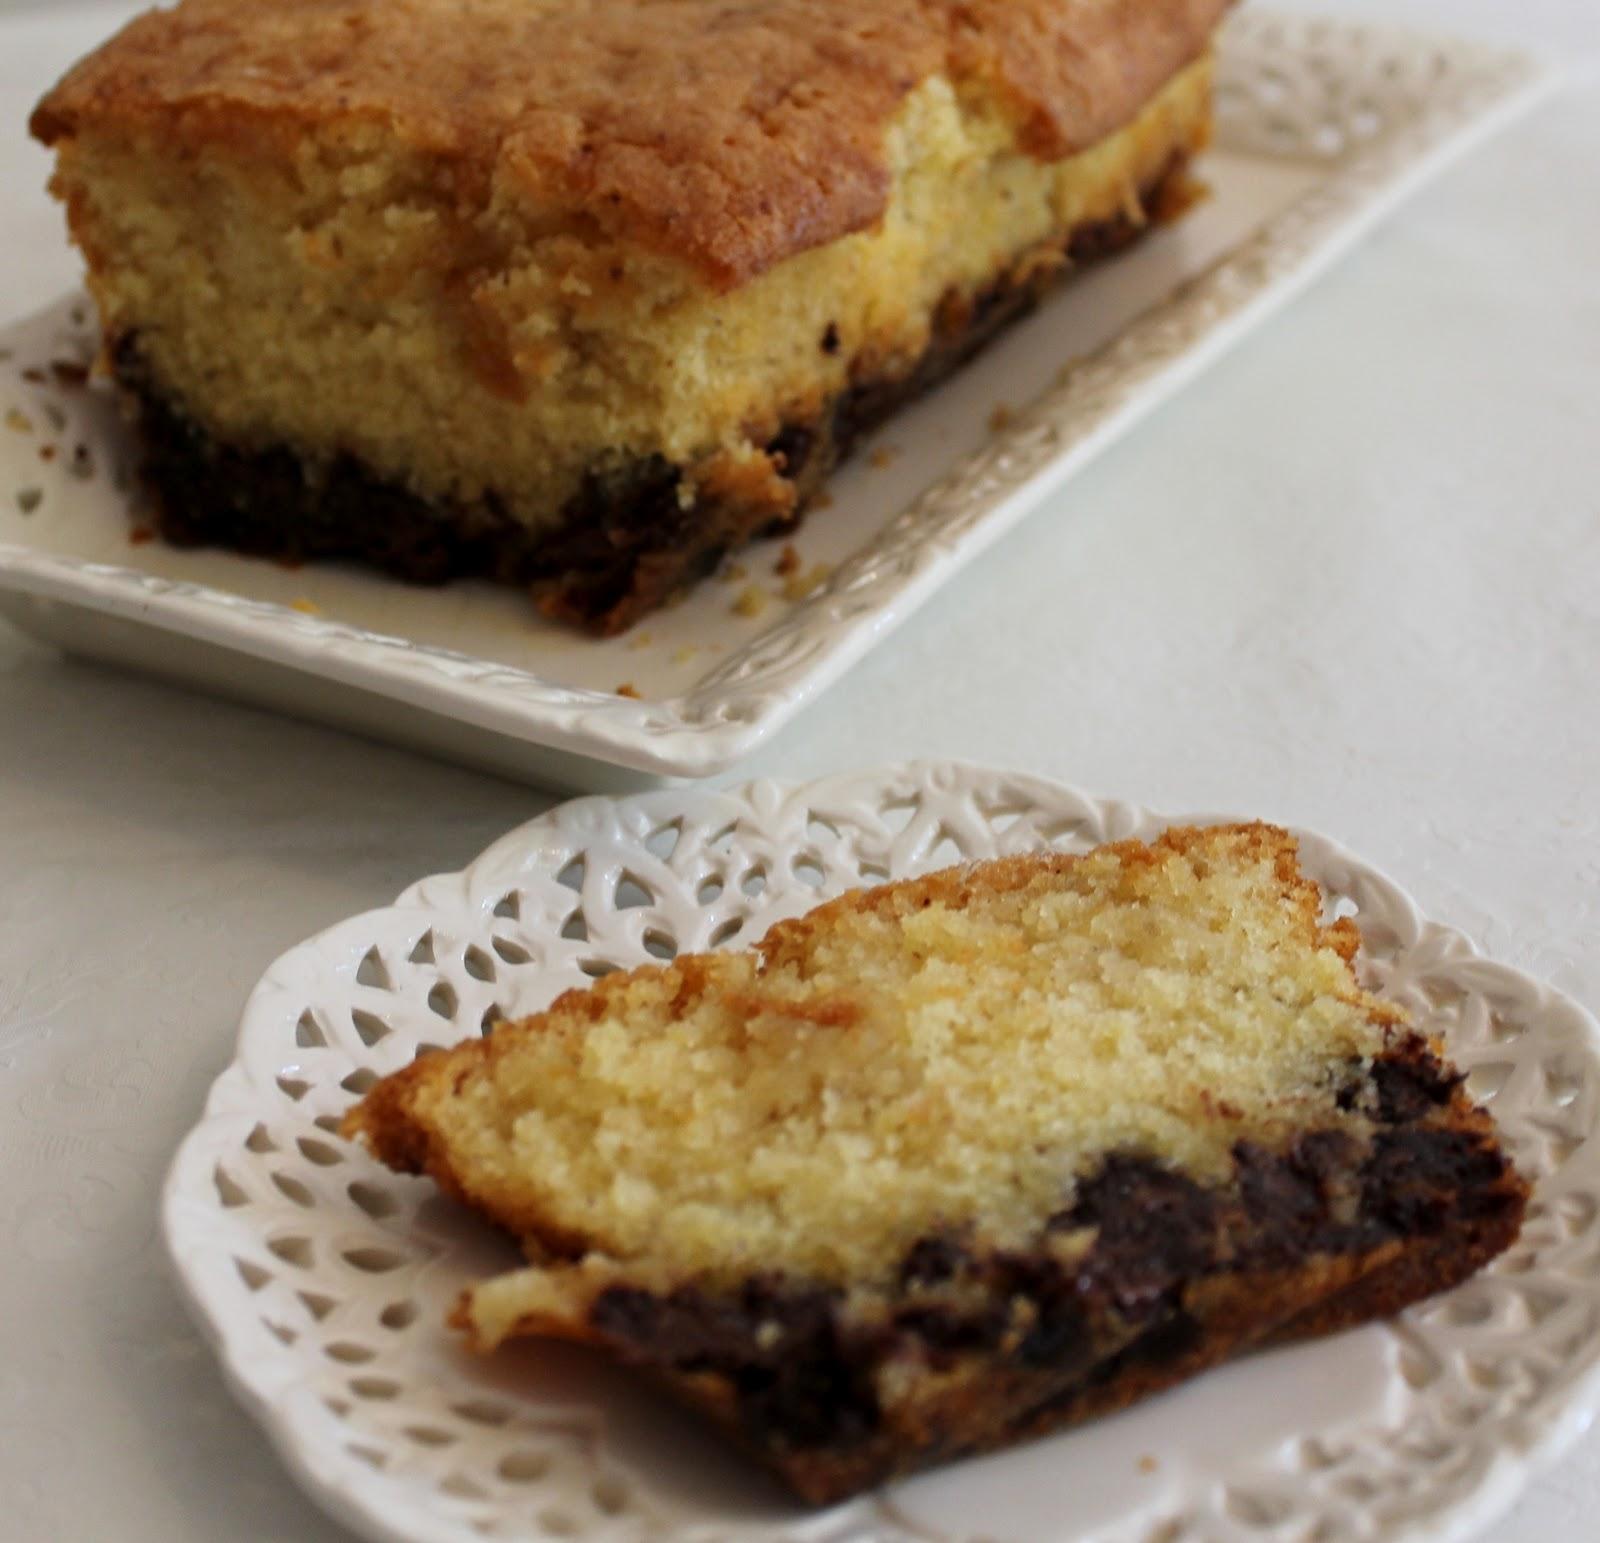 Lemon Drizzle Cake With Chocolate Chunks